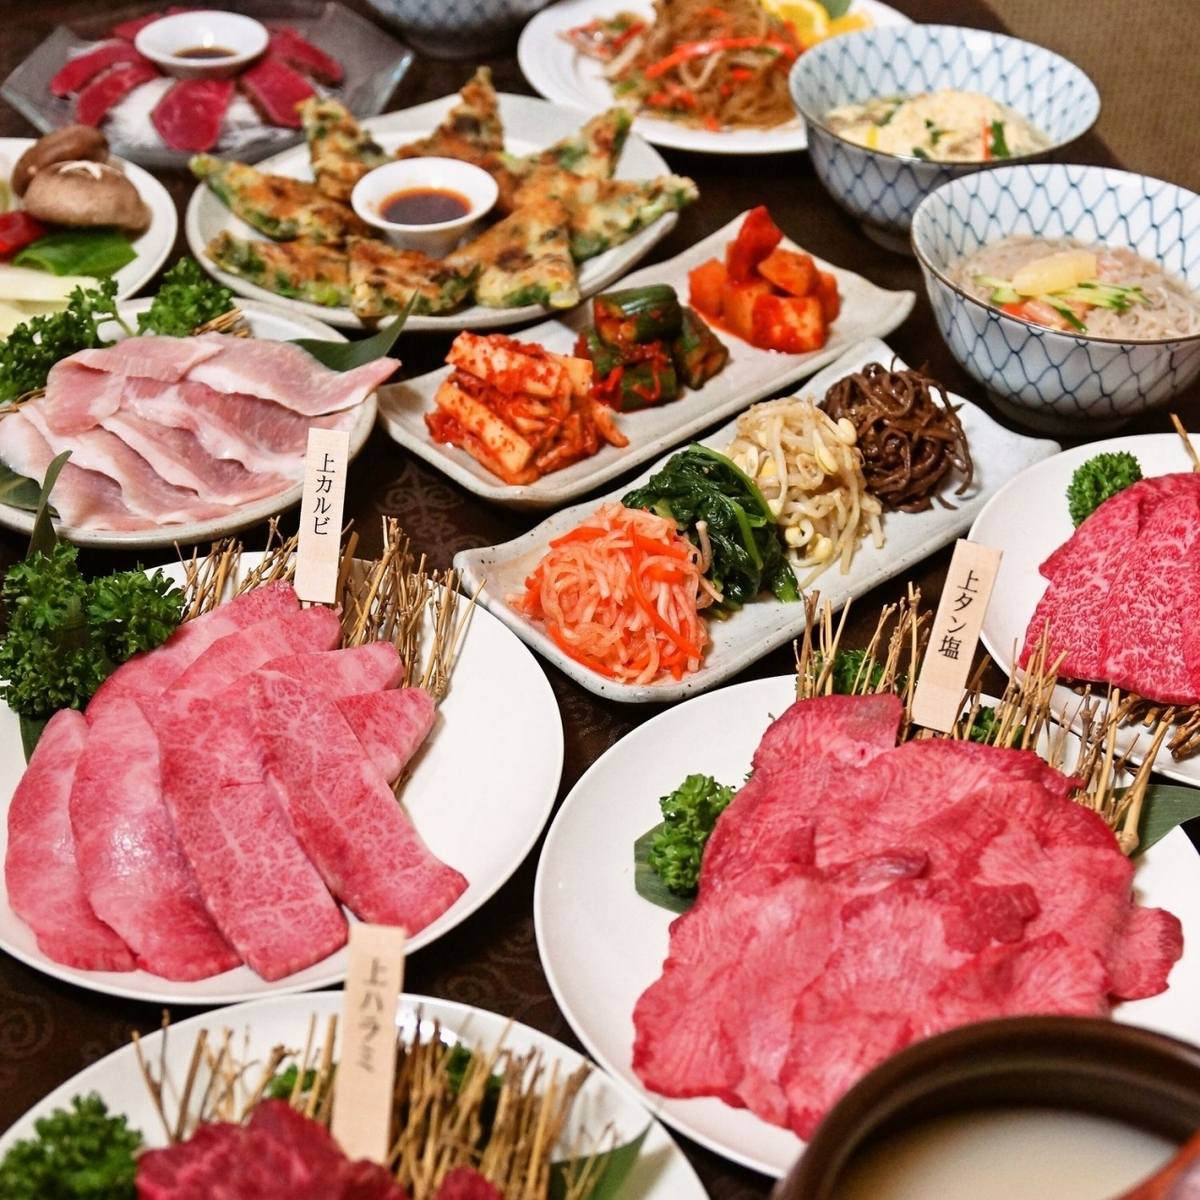 Kuroge Wagyu cattle x banquet course